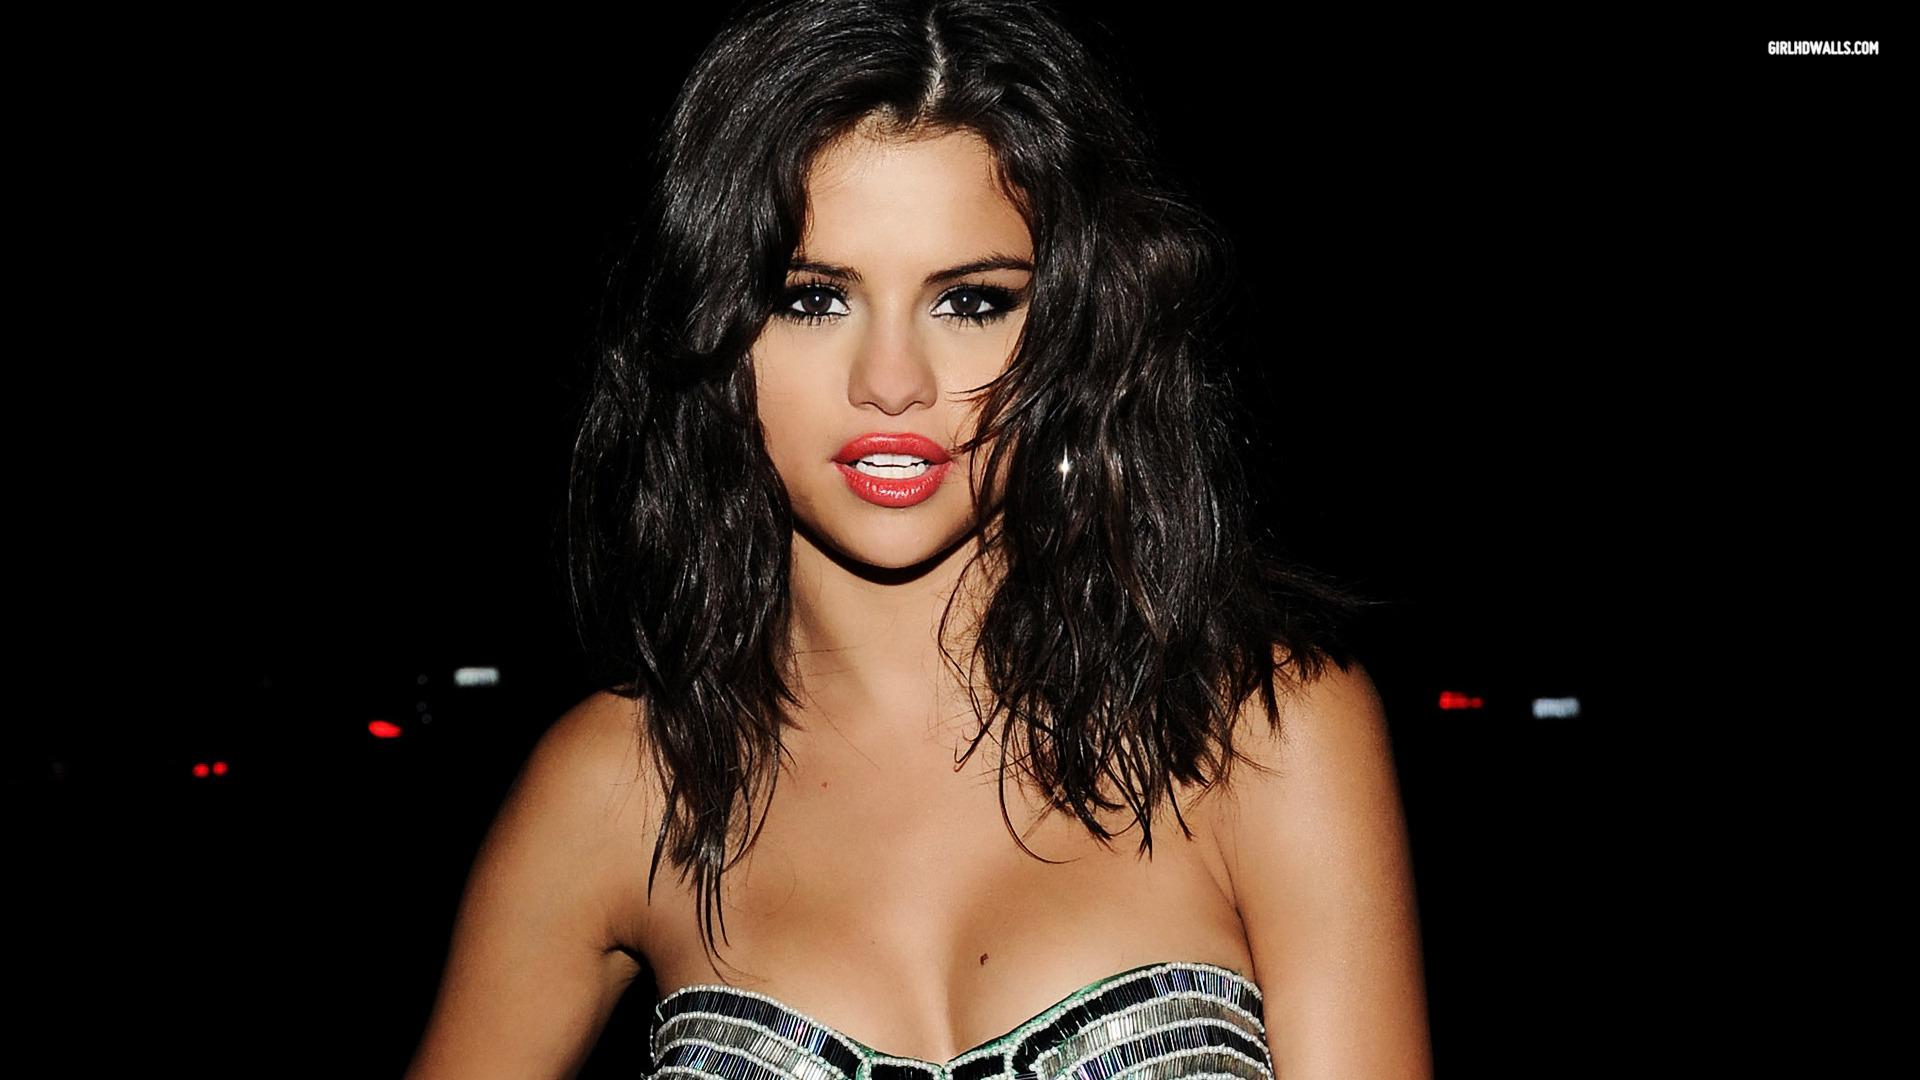 seLena - Selena Gomez Wallpaper (29832351) - Fanpop